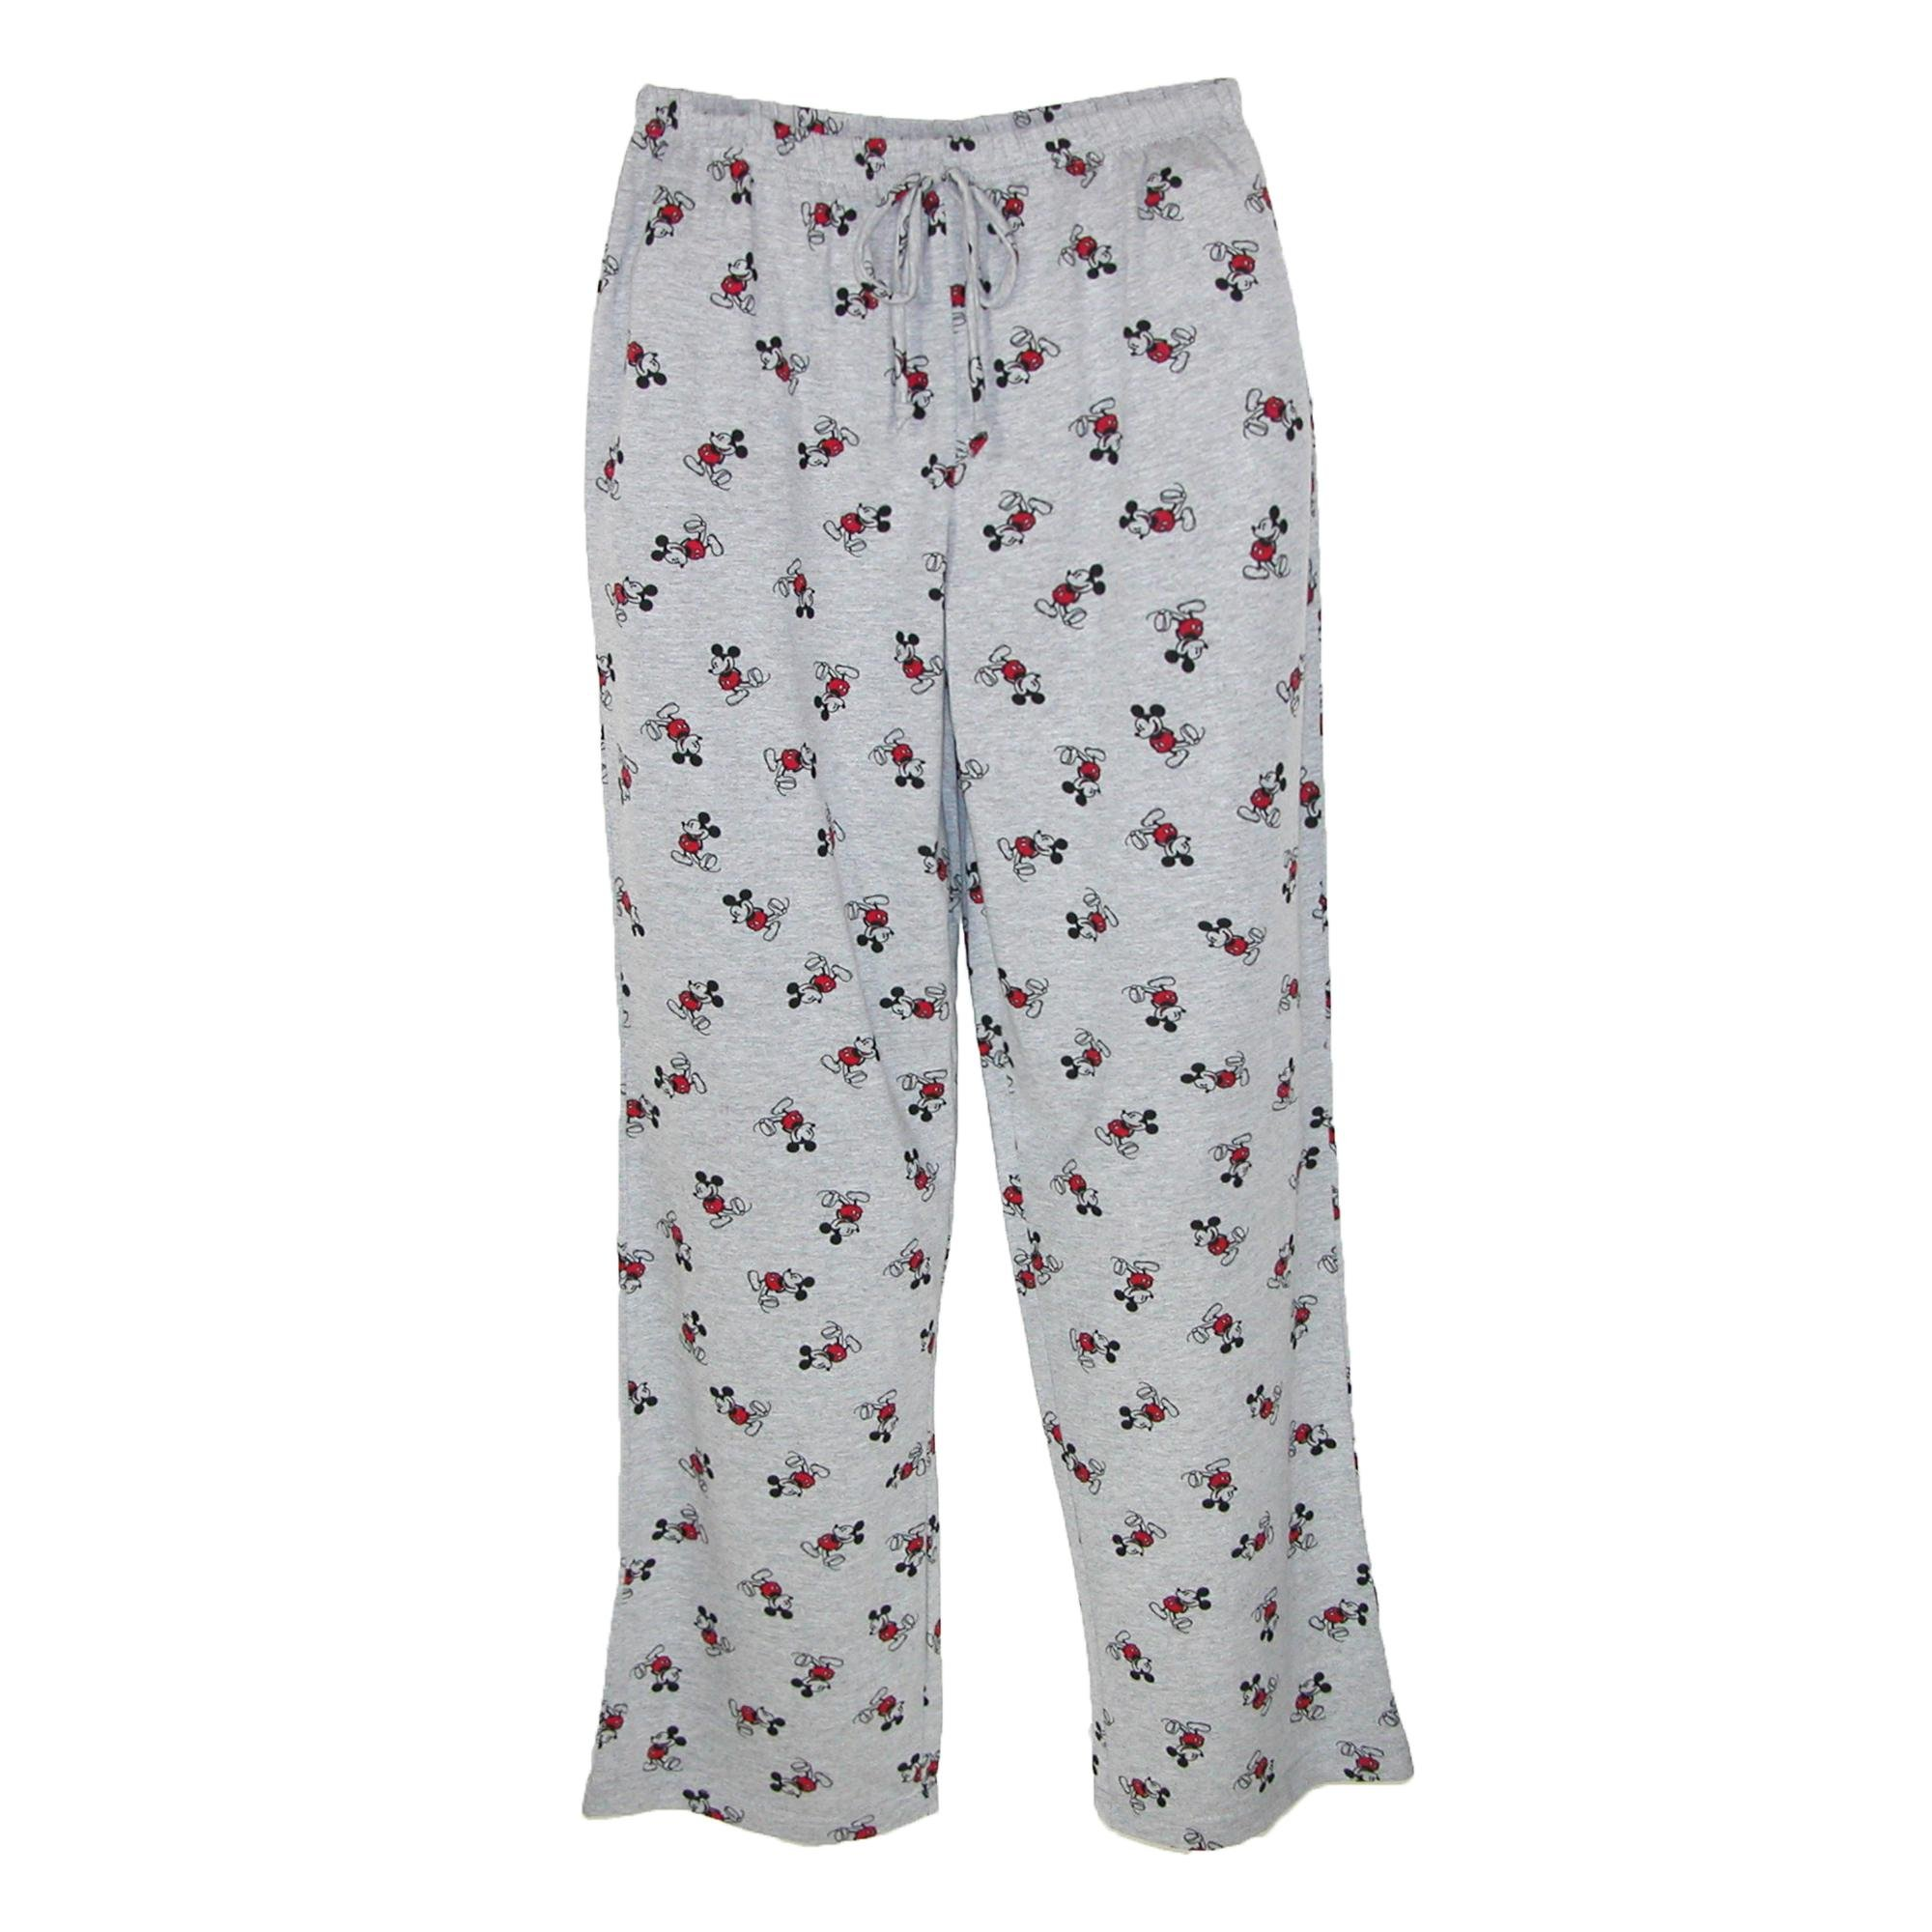 Disney Mickey Mouse Pajama Pants, X-Large, Grey